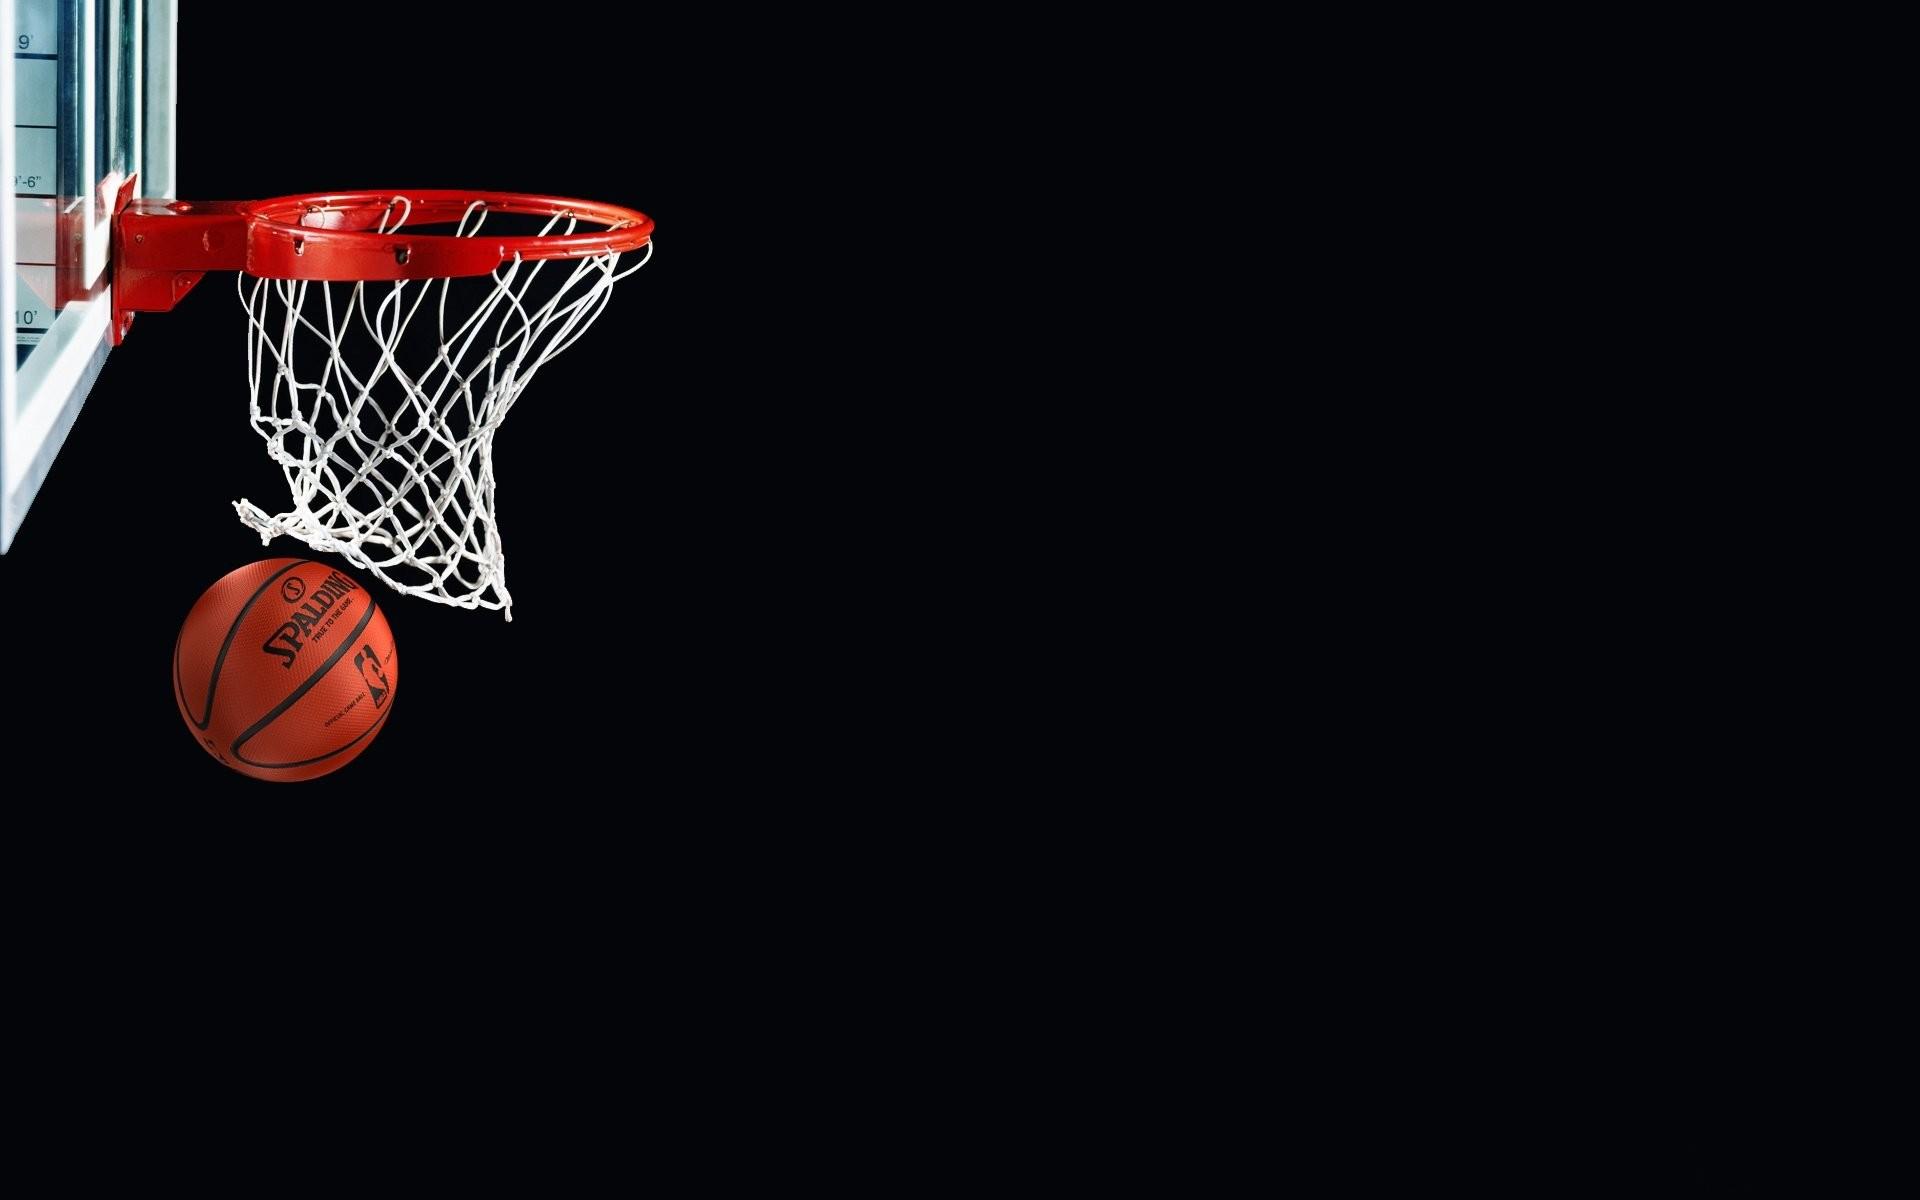 Hd Basketball Wallpaper Wallpapertag